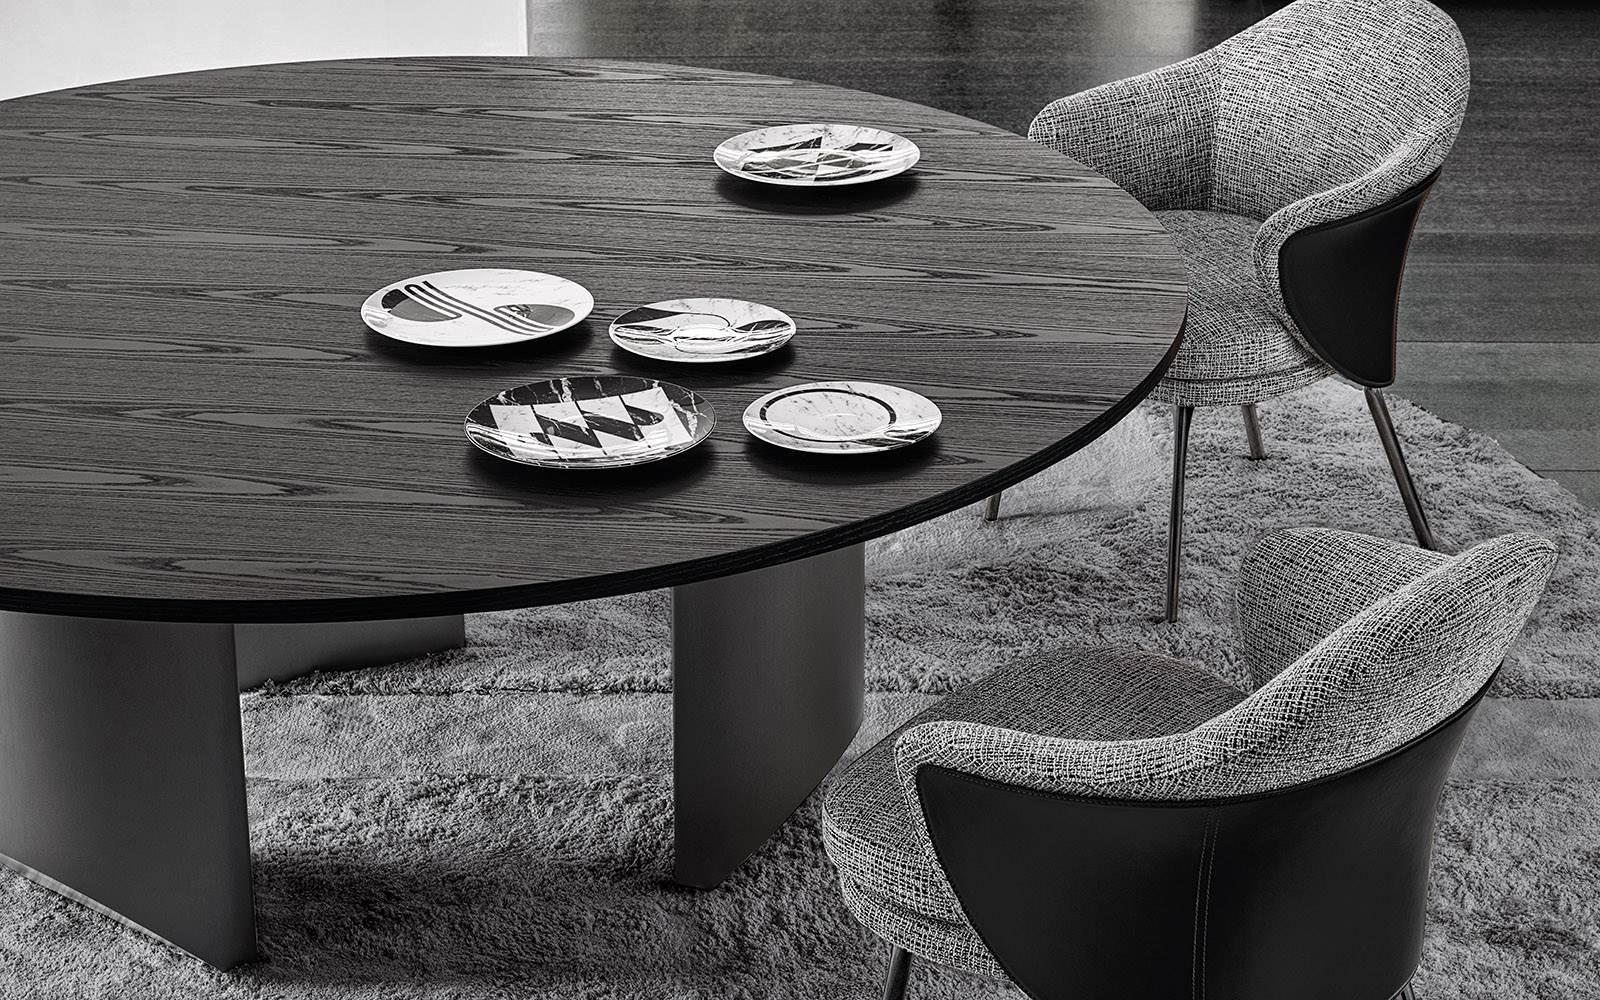 Wedge table dining minotti 4.jpg